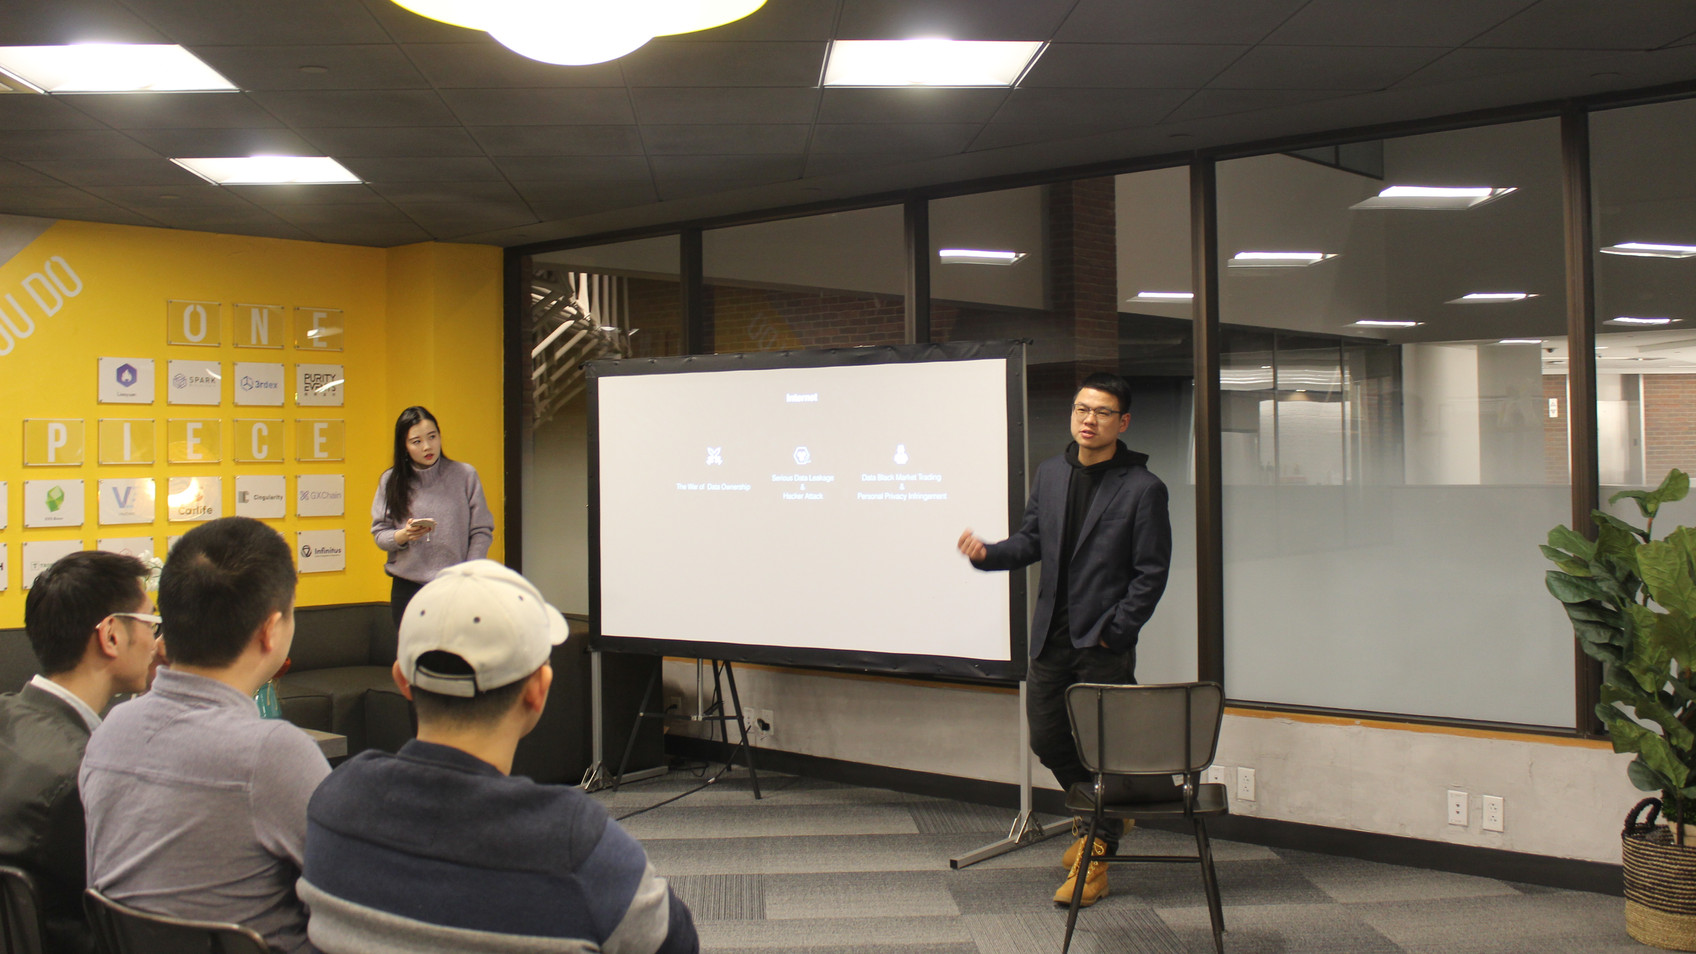 lockchain _ Data Social Night Meetup at